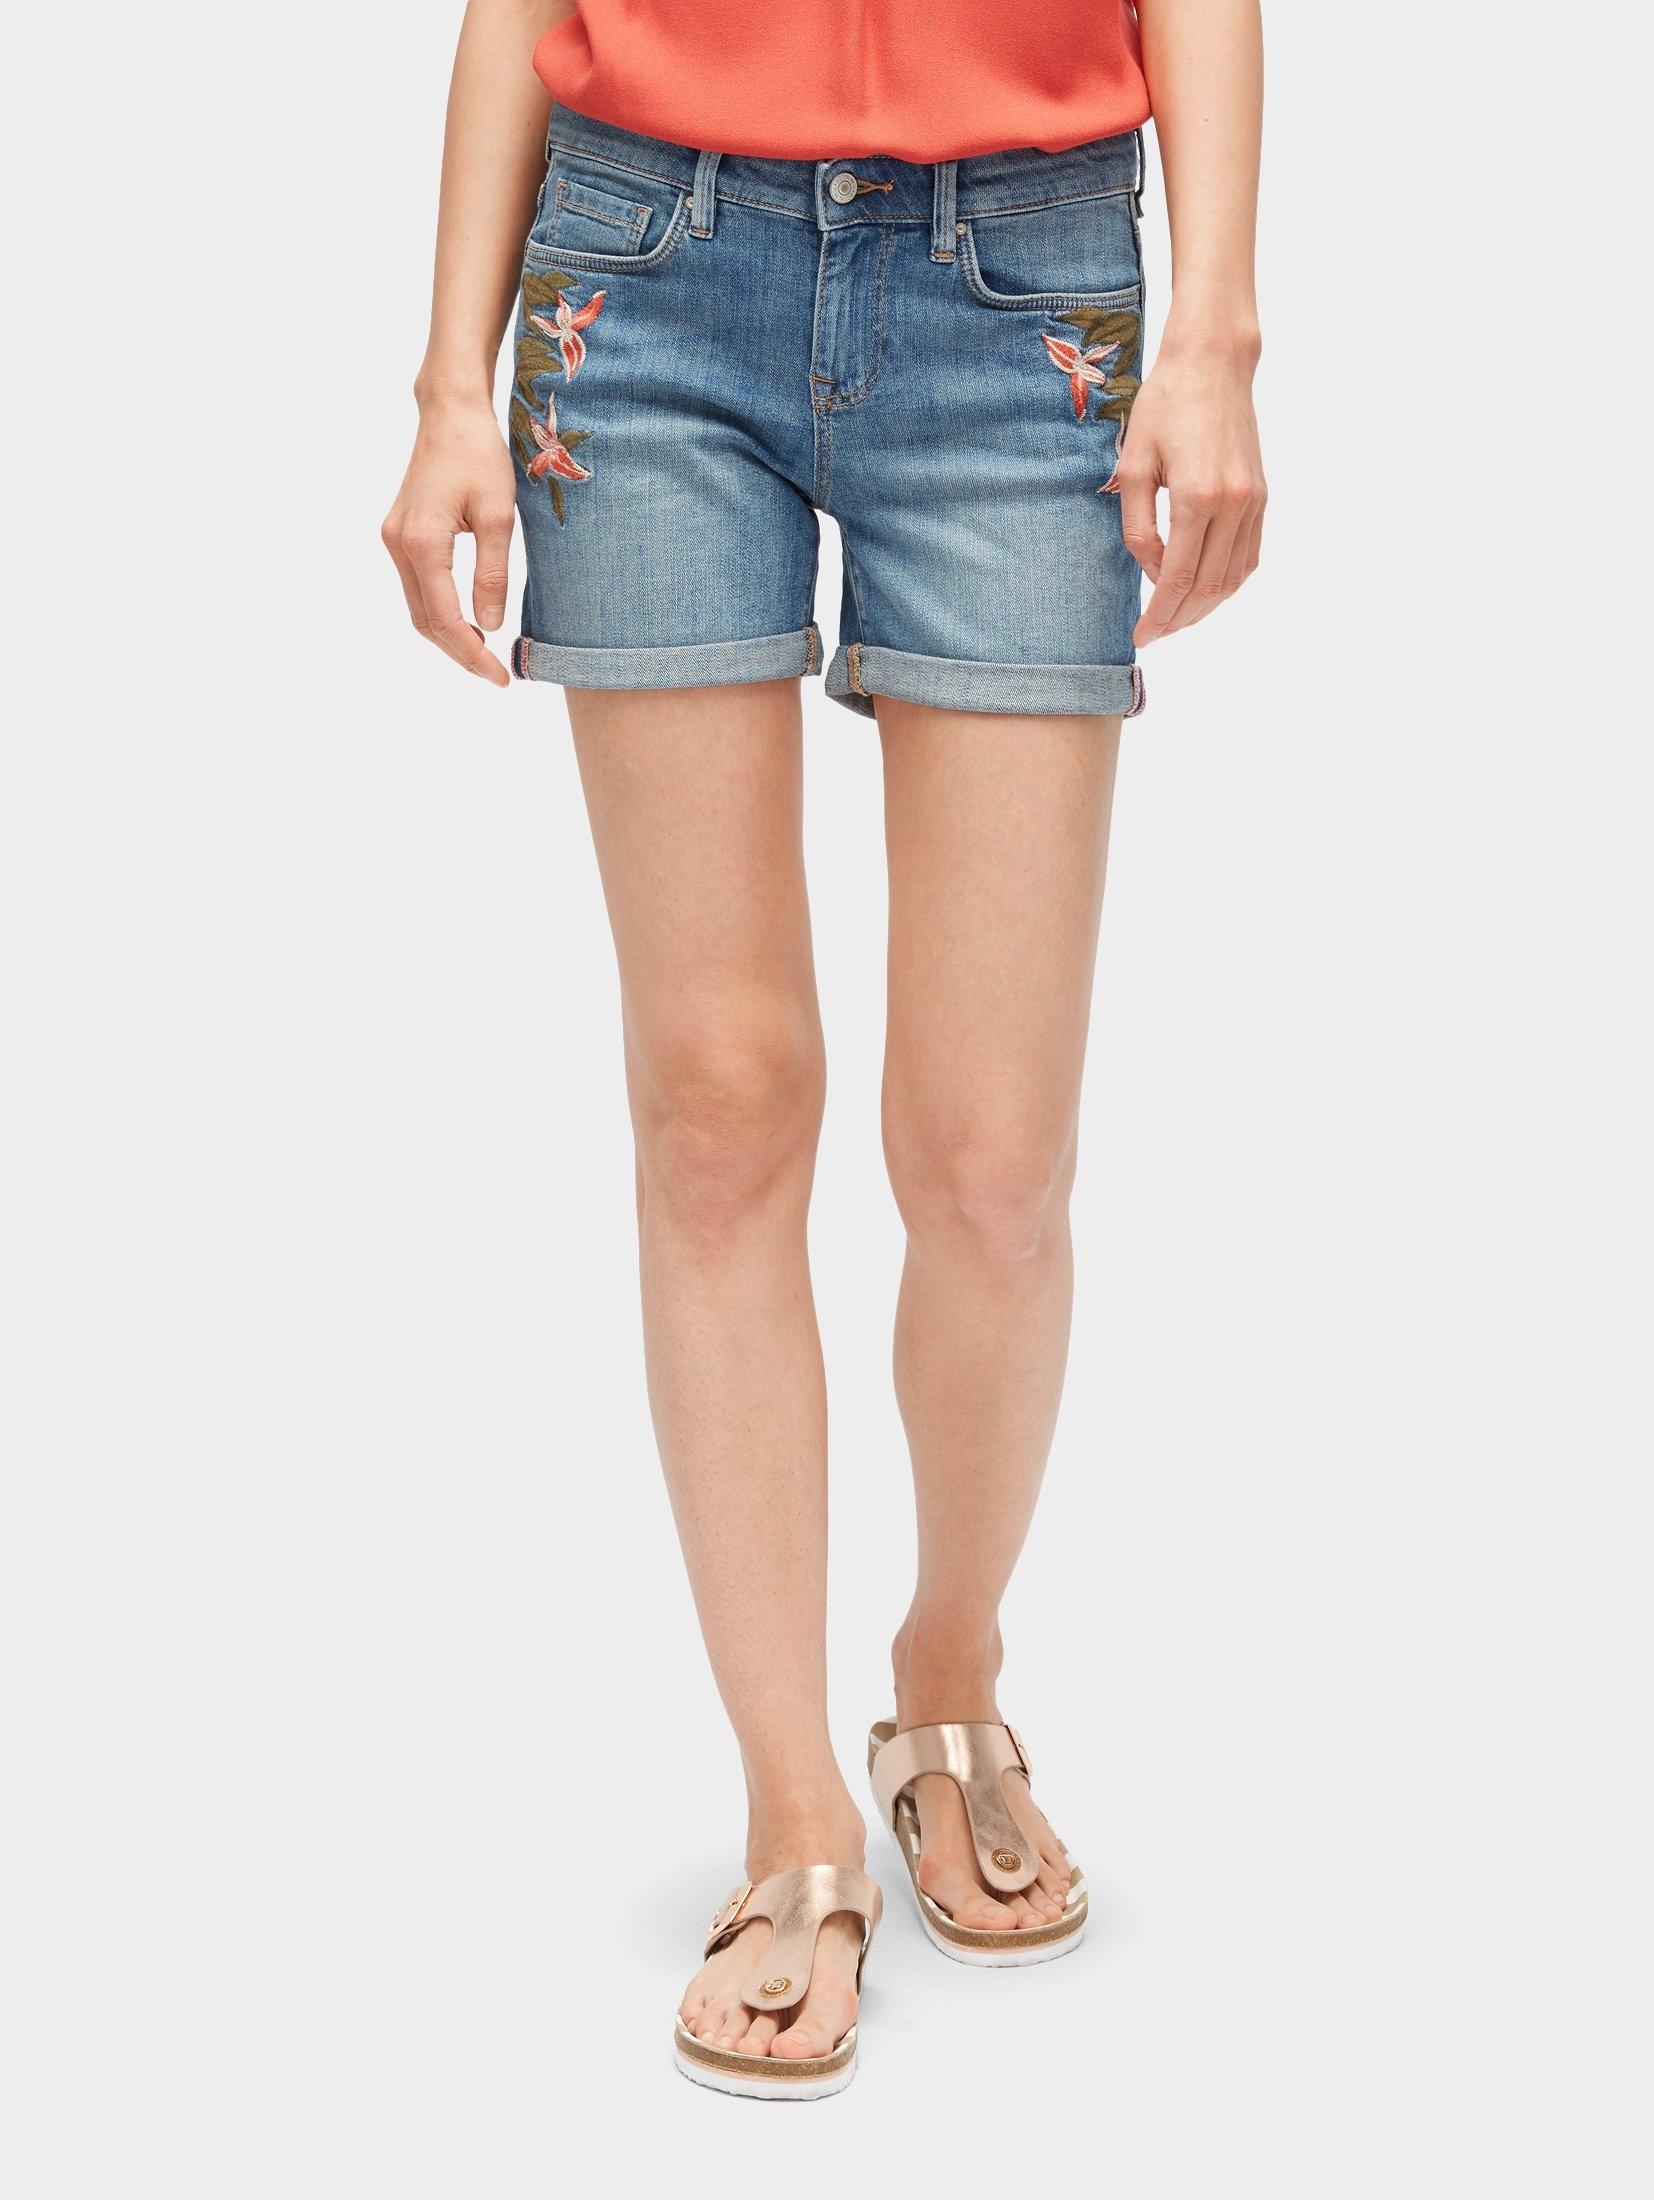 Tom Tailor jeansshort »Alexa Jeans Shorts« in de online shop   OTTO 85619b72e7